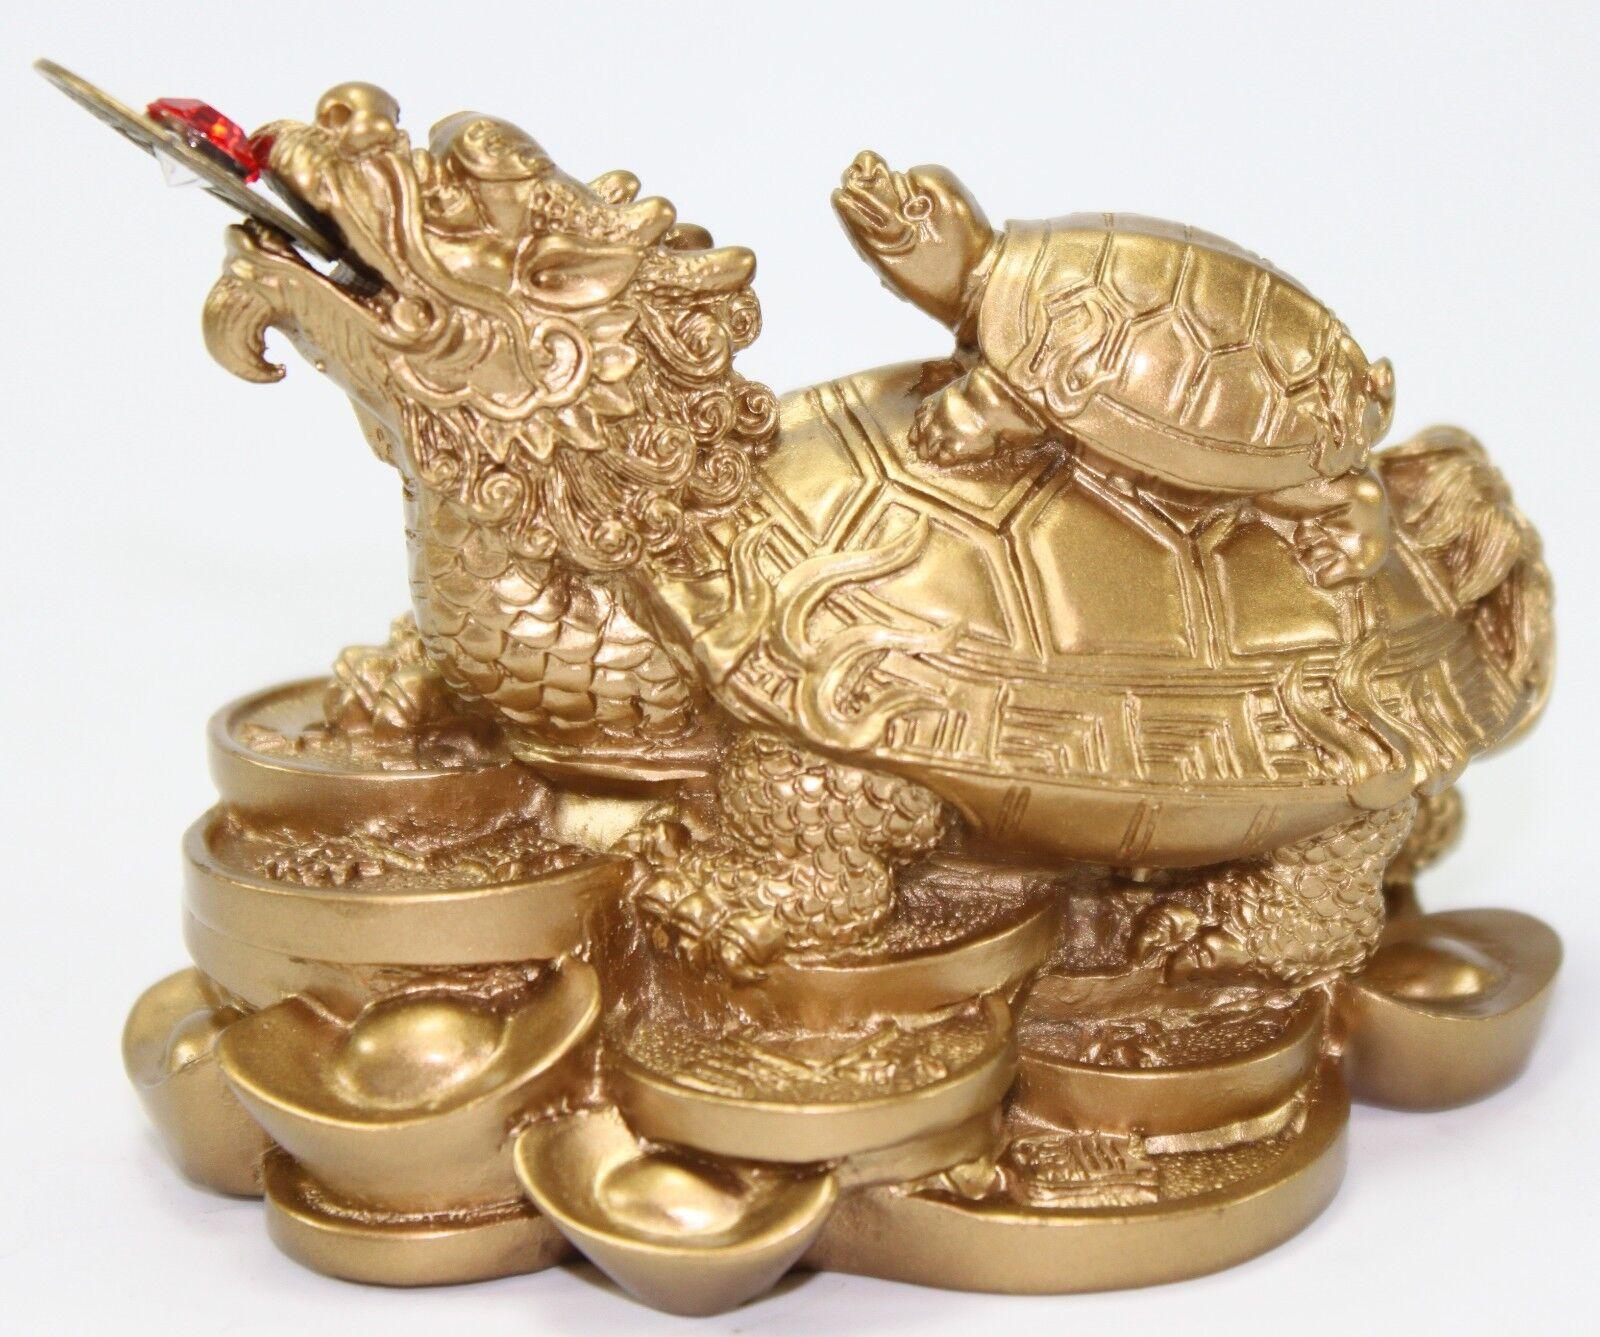 feng shui dragon turtle gold statue fortune symbol mythical animal figurine gift ebay. Black Bedroom Furniture Sets. Home Design Ideas